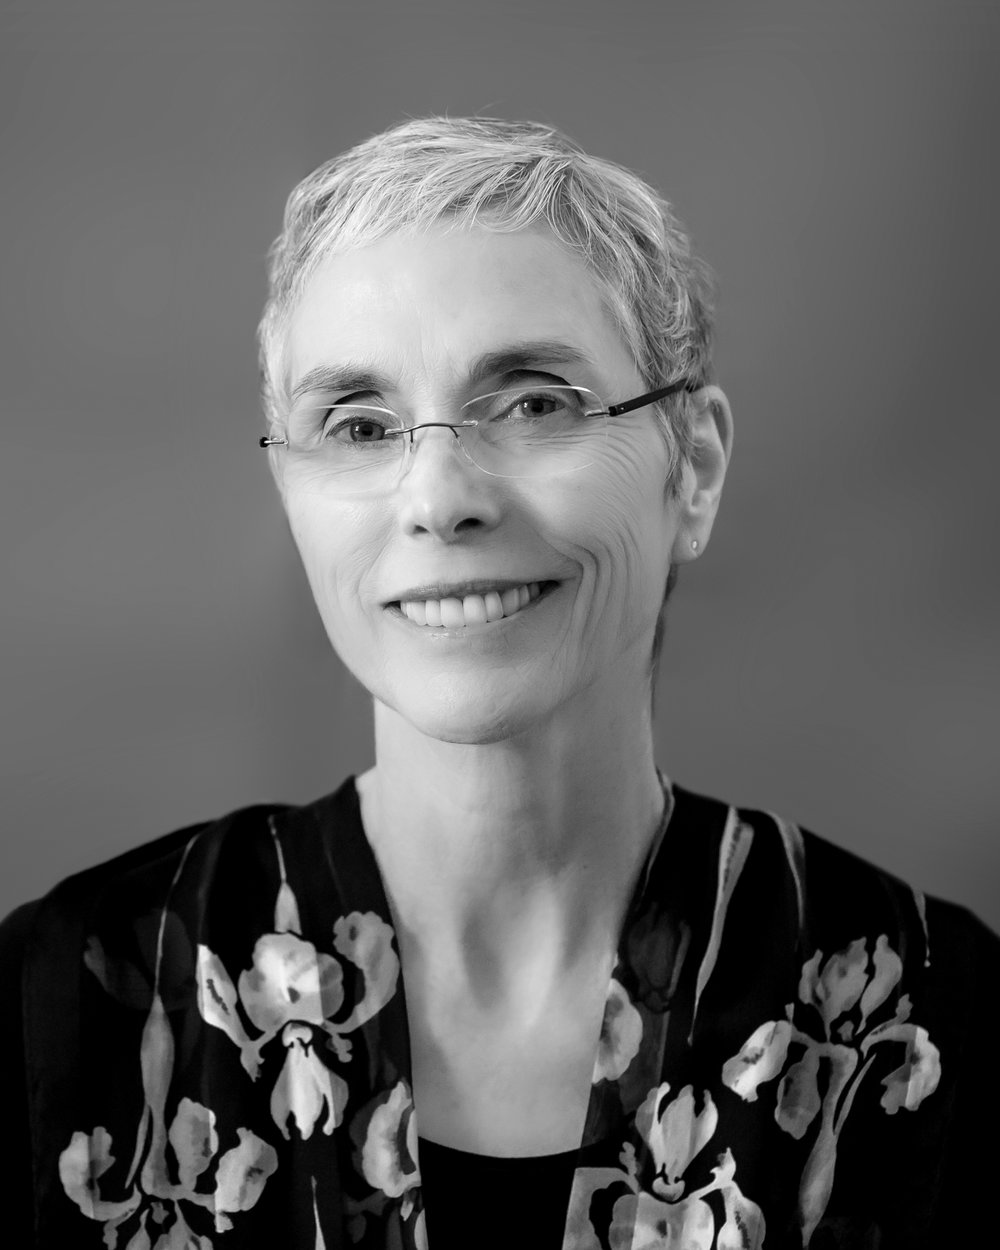 Patricia McKernon Runkle (600 dpi).jpg